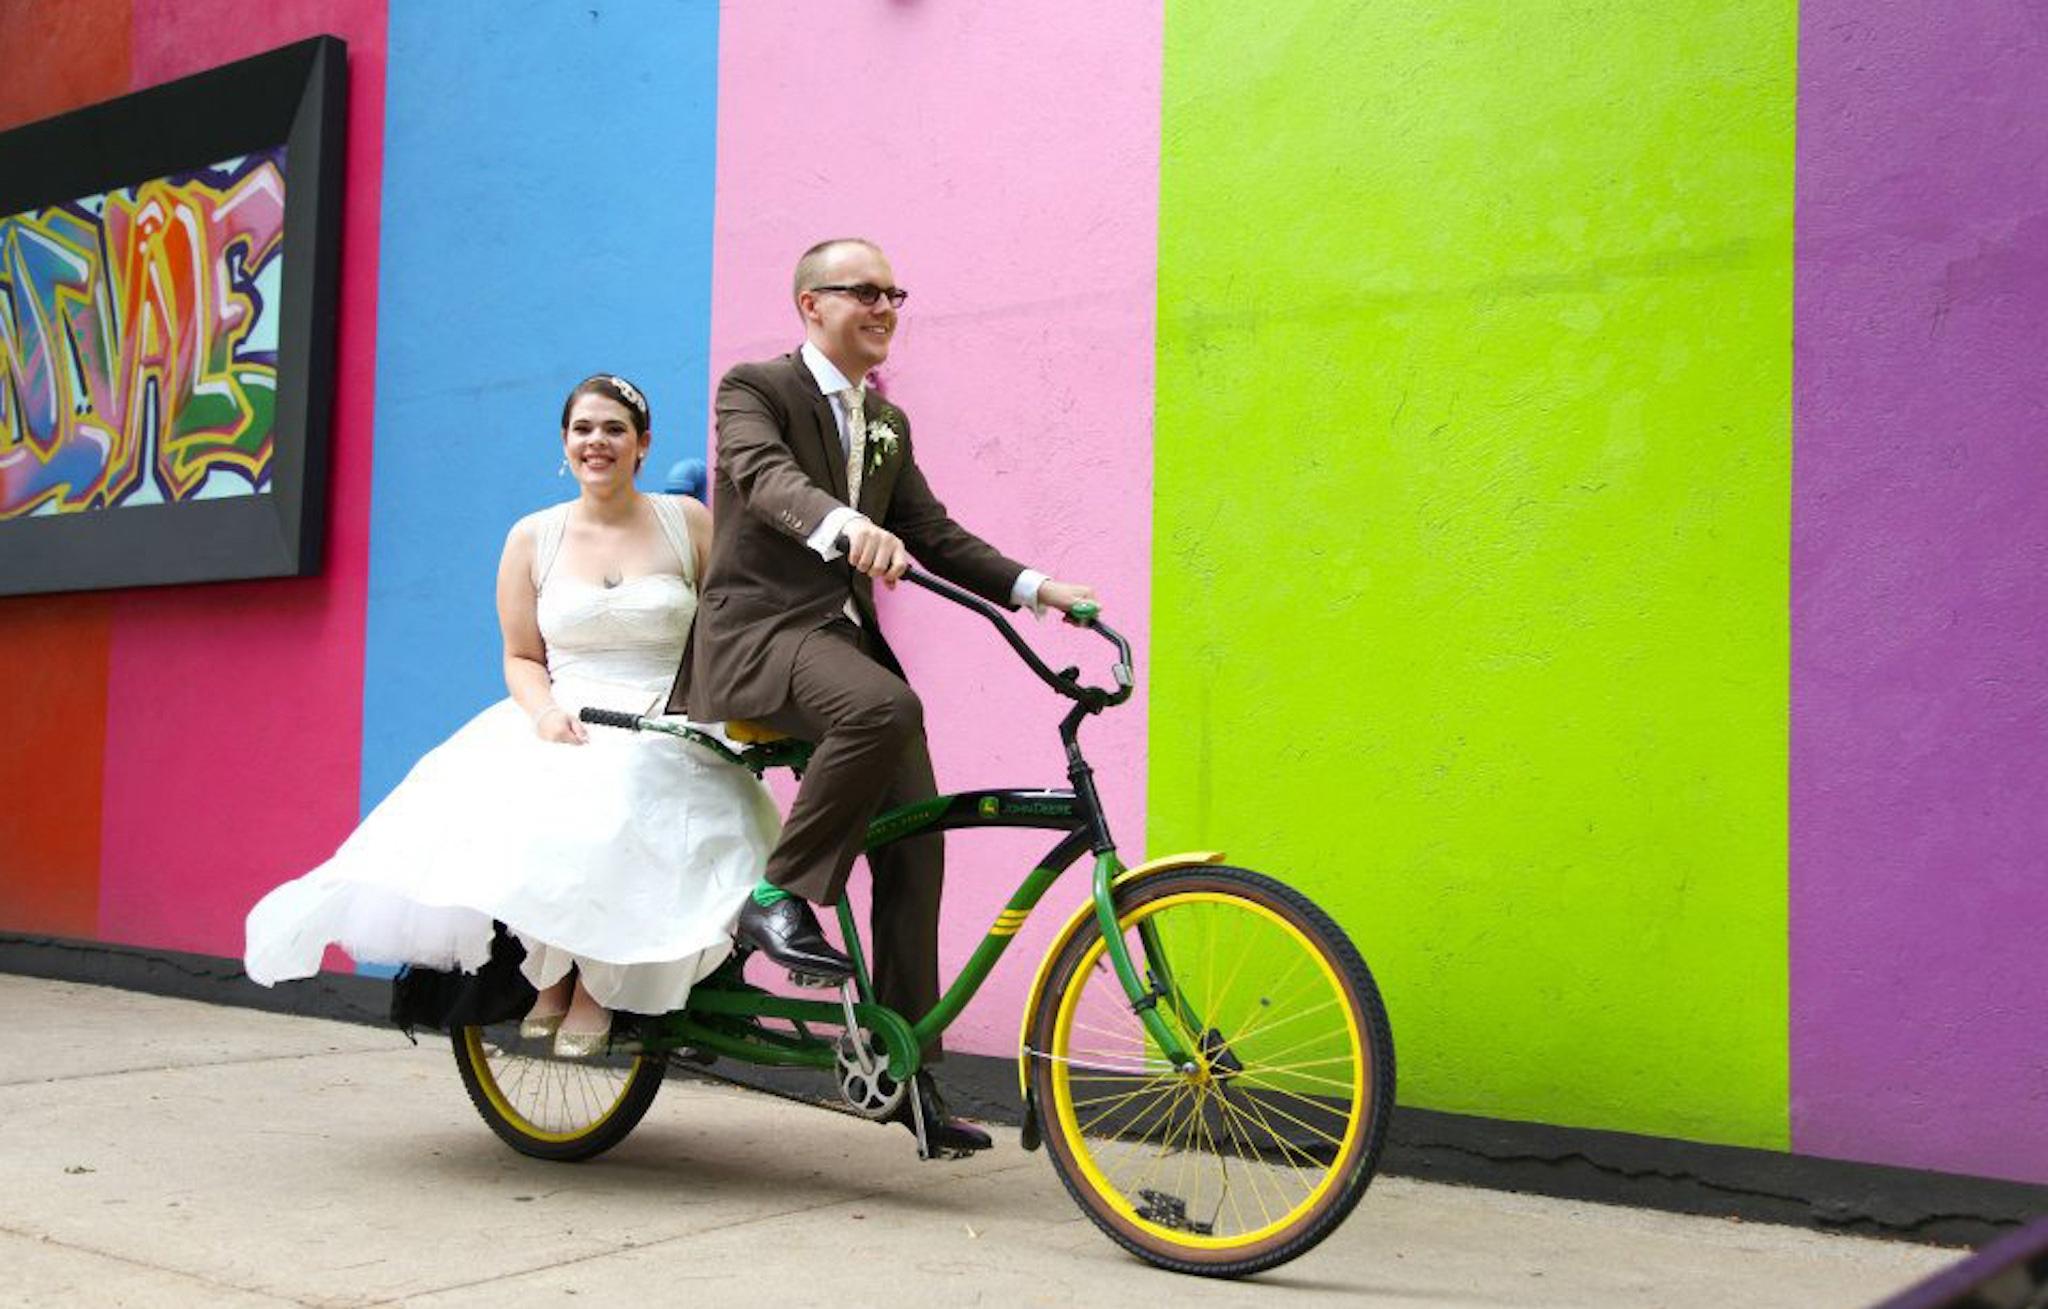 Bride and groom on bike